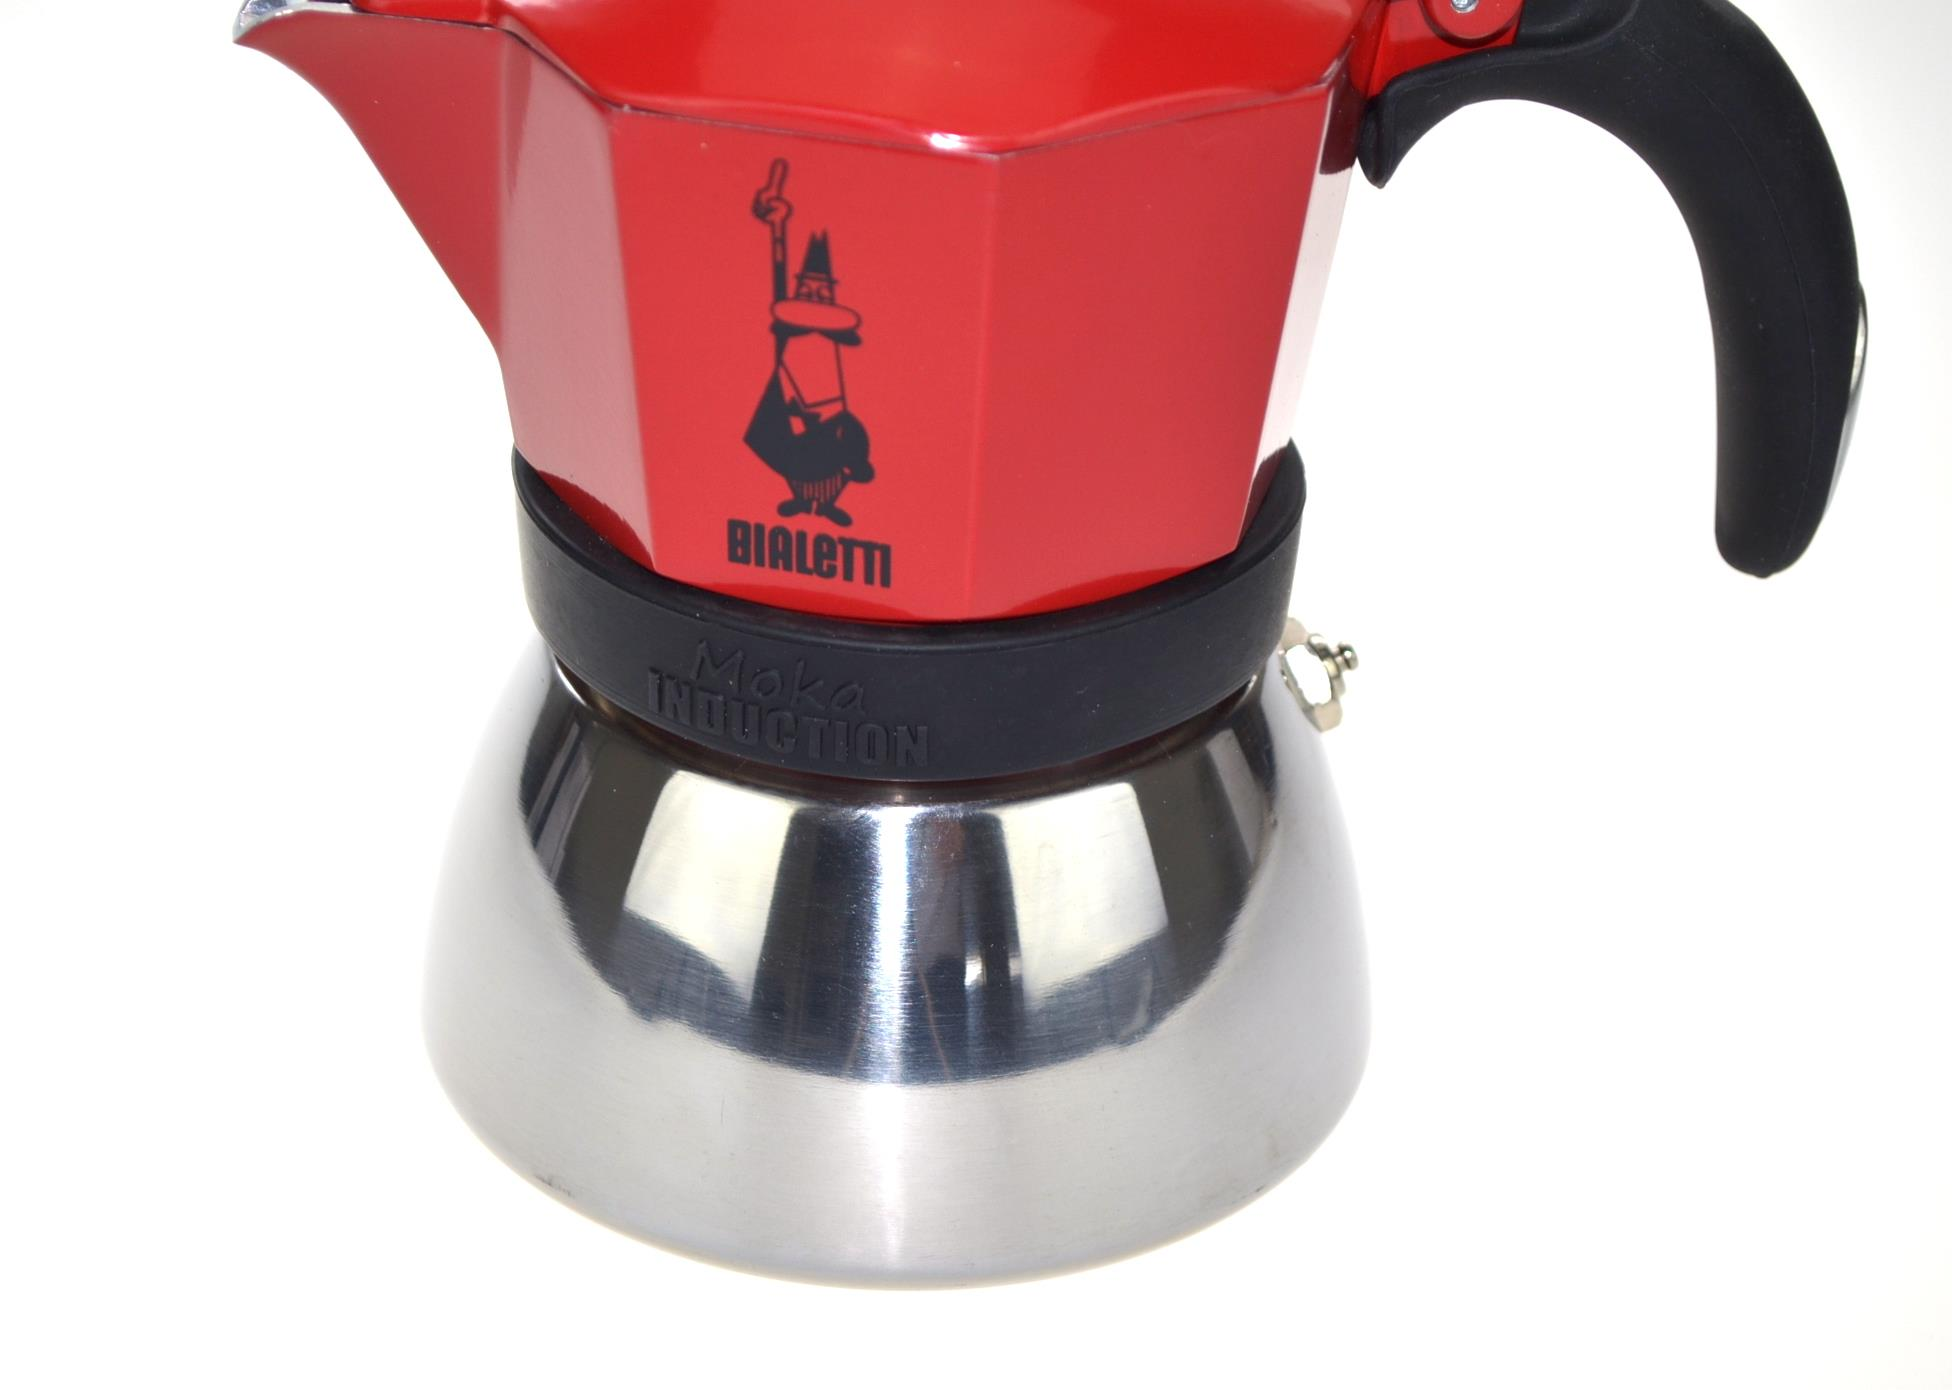 BIALETTI Moka pot  Moka Induction (red color) Kafijas automāts